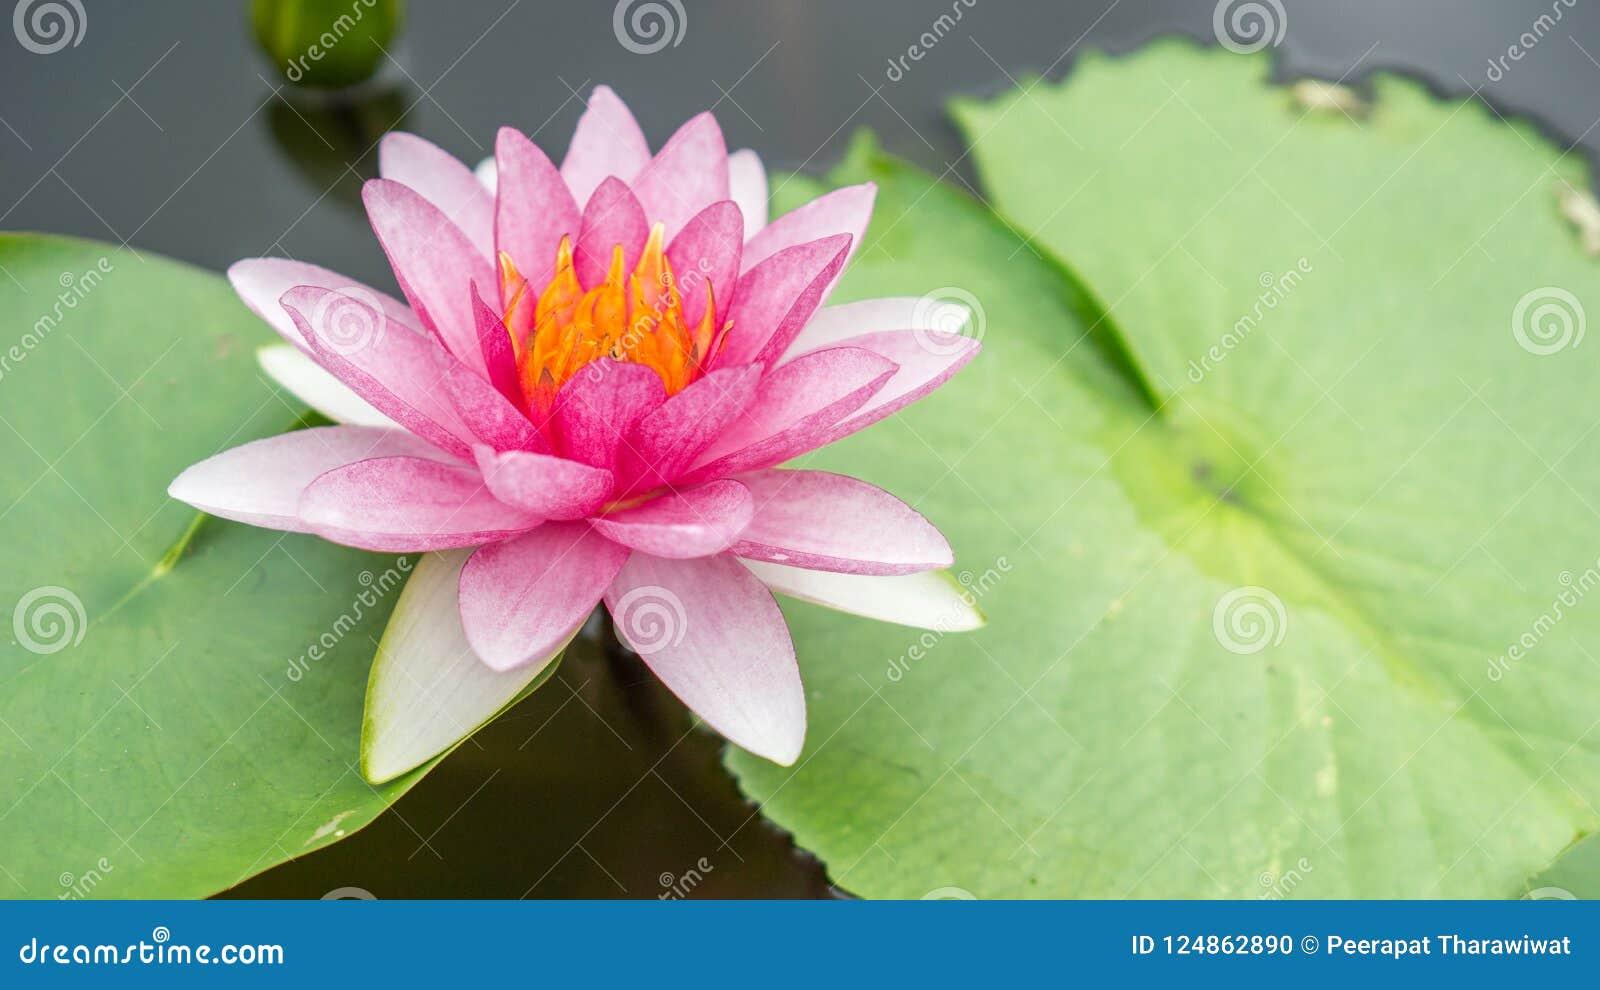 Beautiful pink lotus flower in water and copy space use for lot download beautiful pink lotus flower in water and copy space use for lot stock photo izmirmasajfo